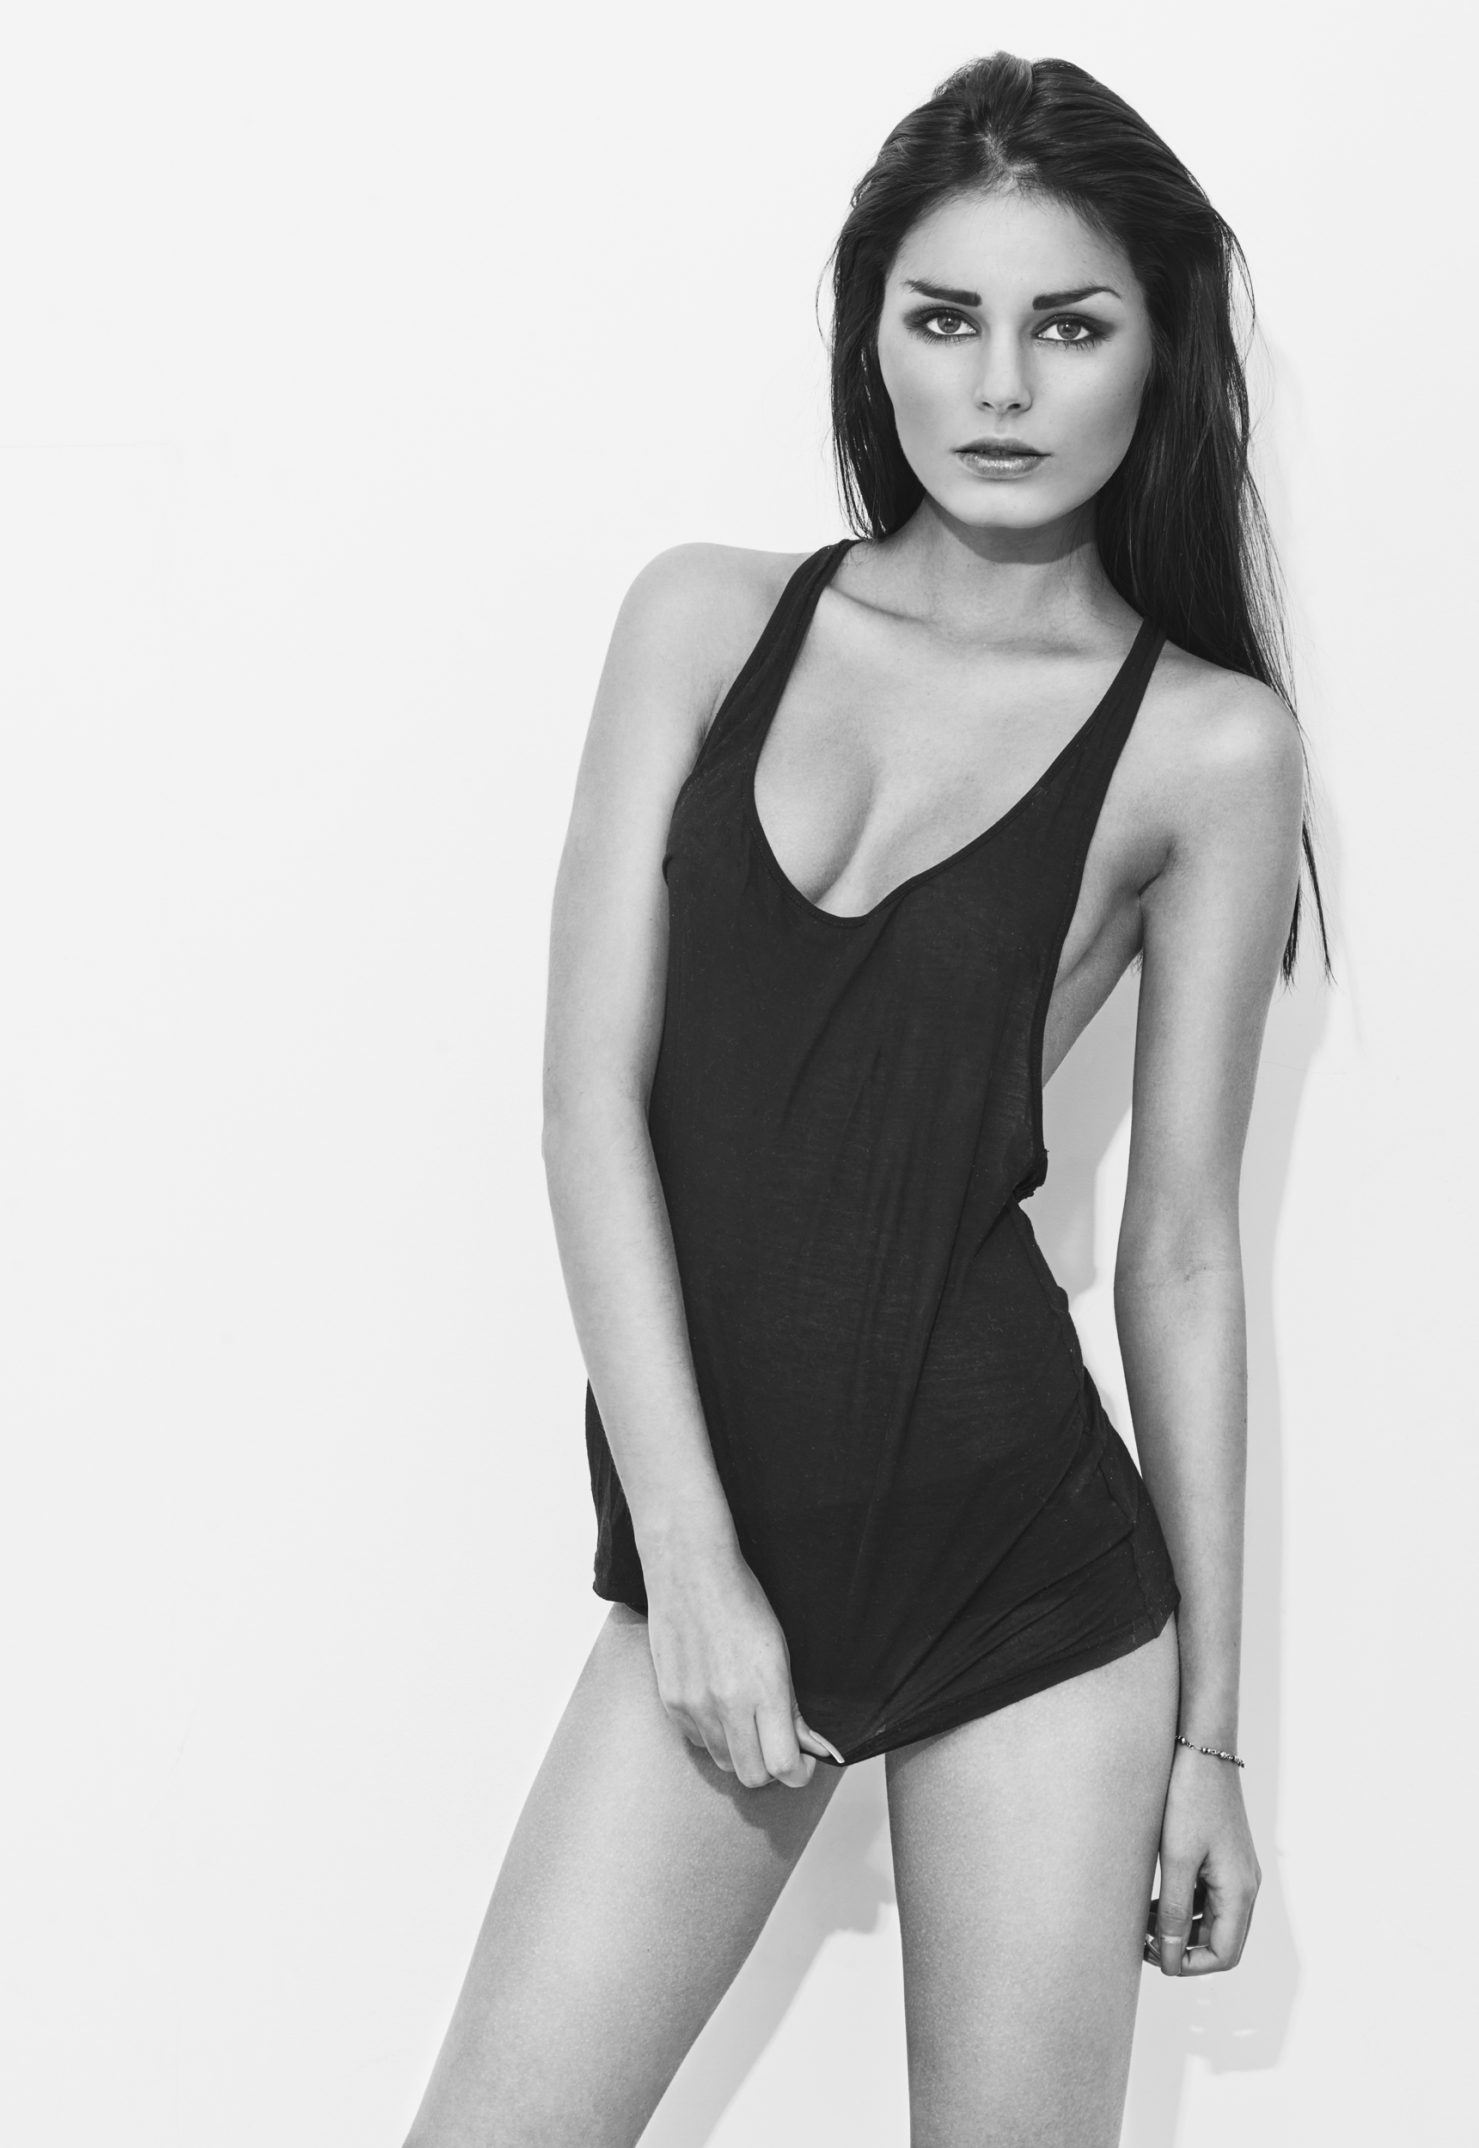 Danielle Schmidt